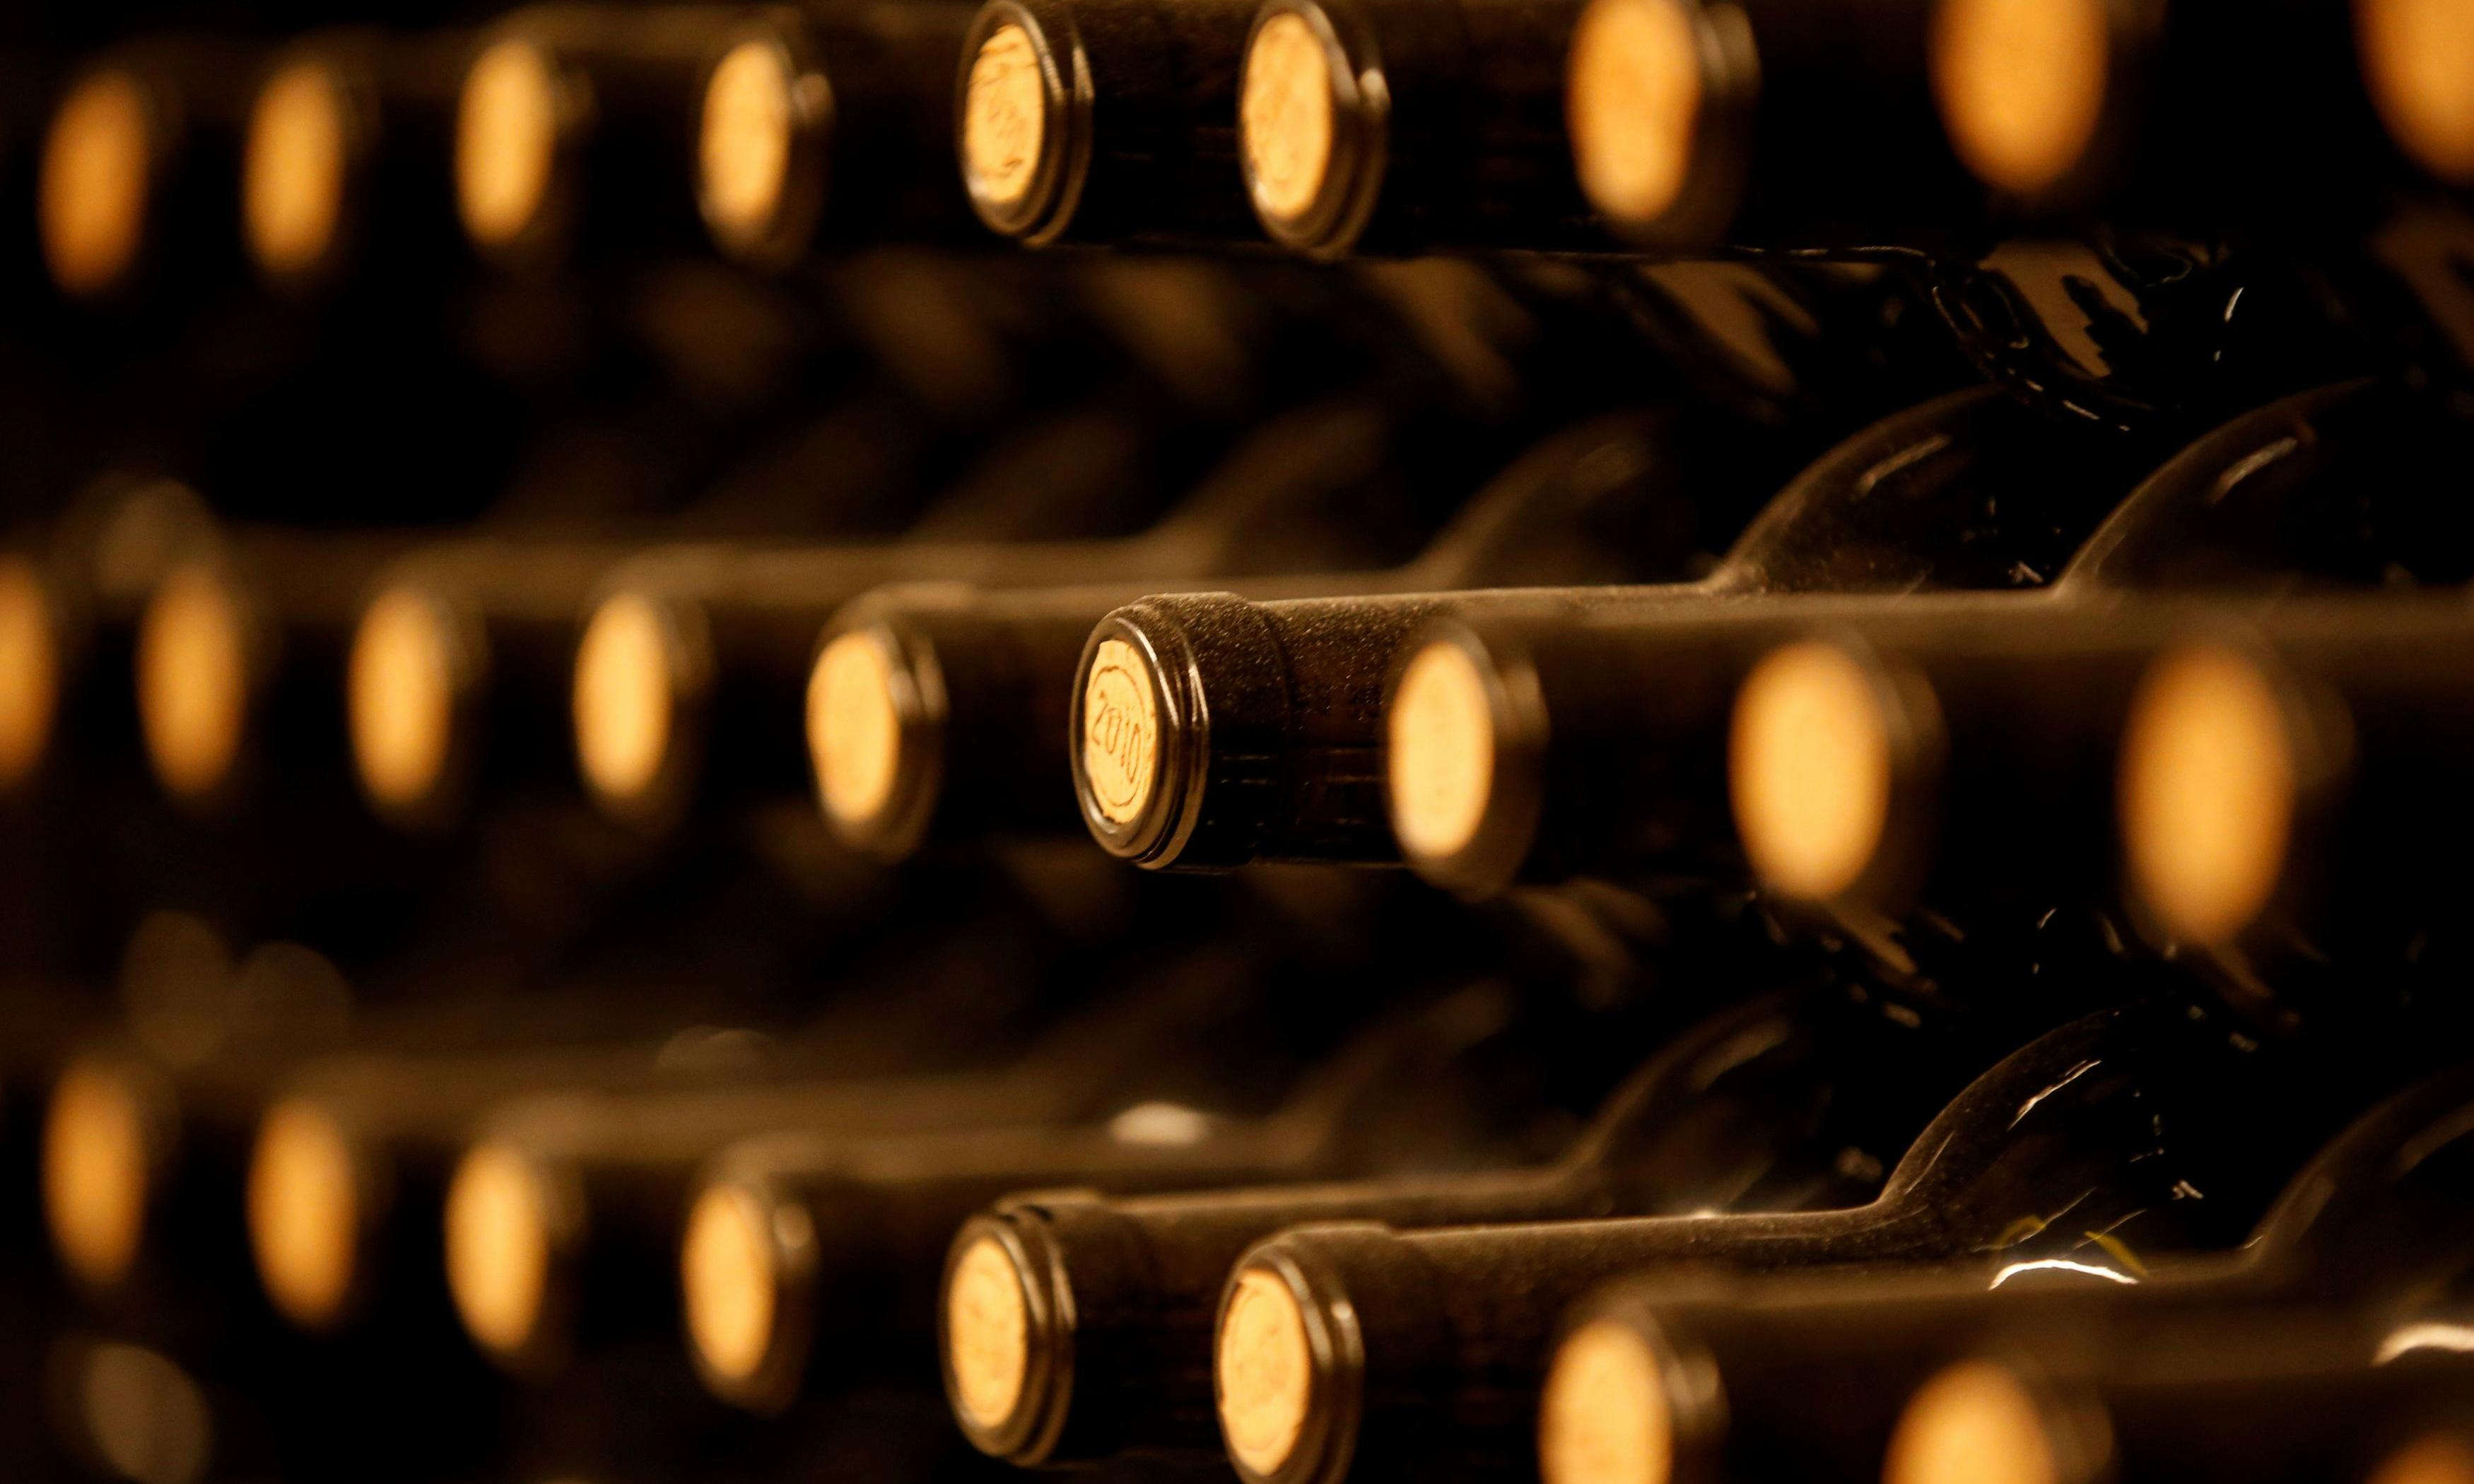 Belgian woman dies after taking sip of MDMA-laced wine